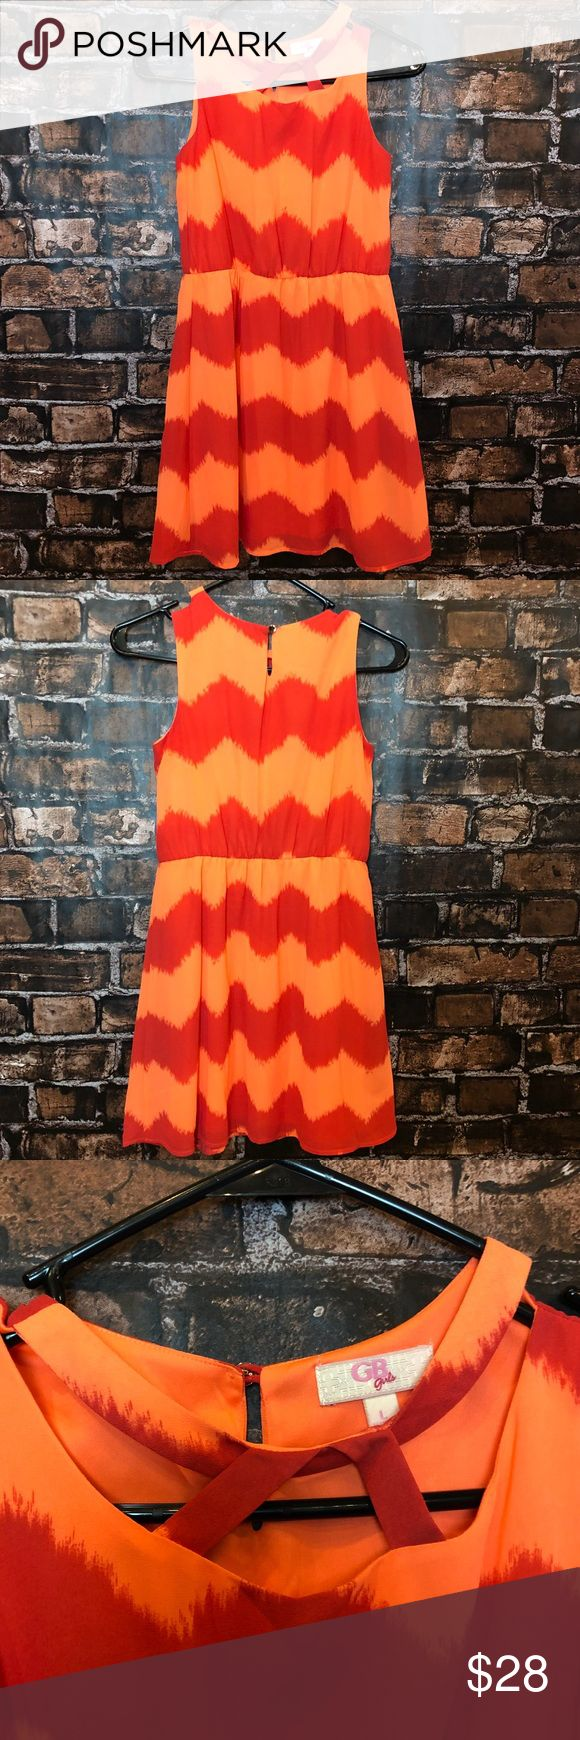 GB girls summer dress! Size L. Light/dark orange chevron dress with crisscross neck line! Like new condition. GB girl Dresses Casual